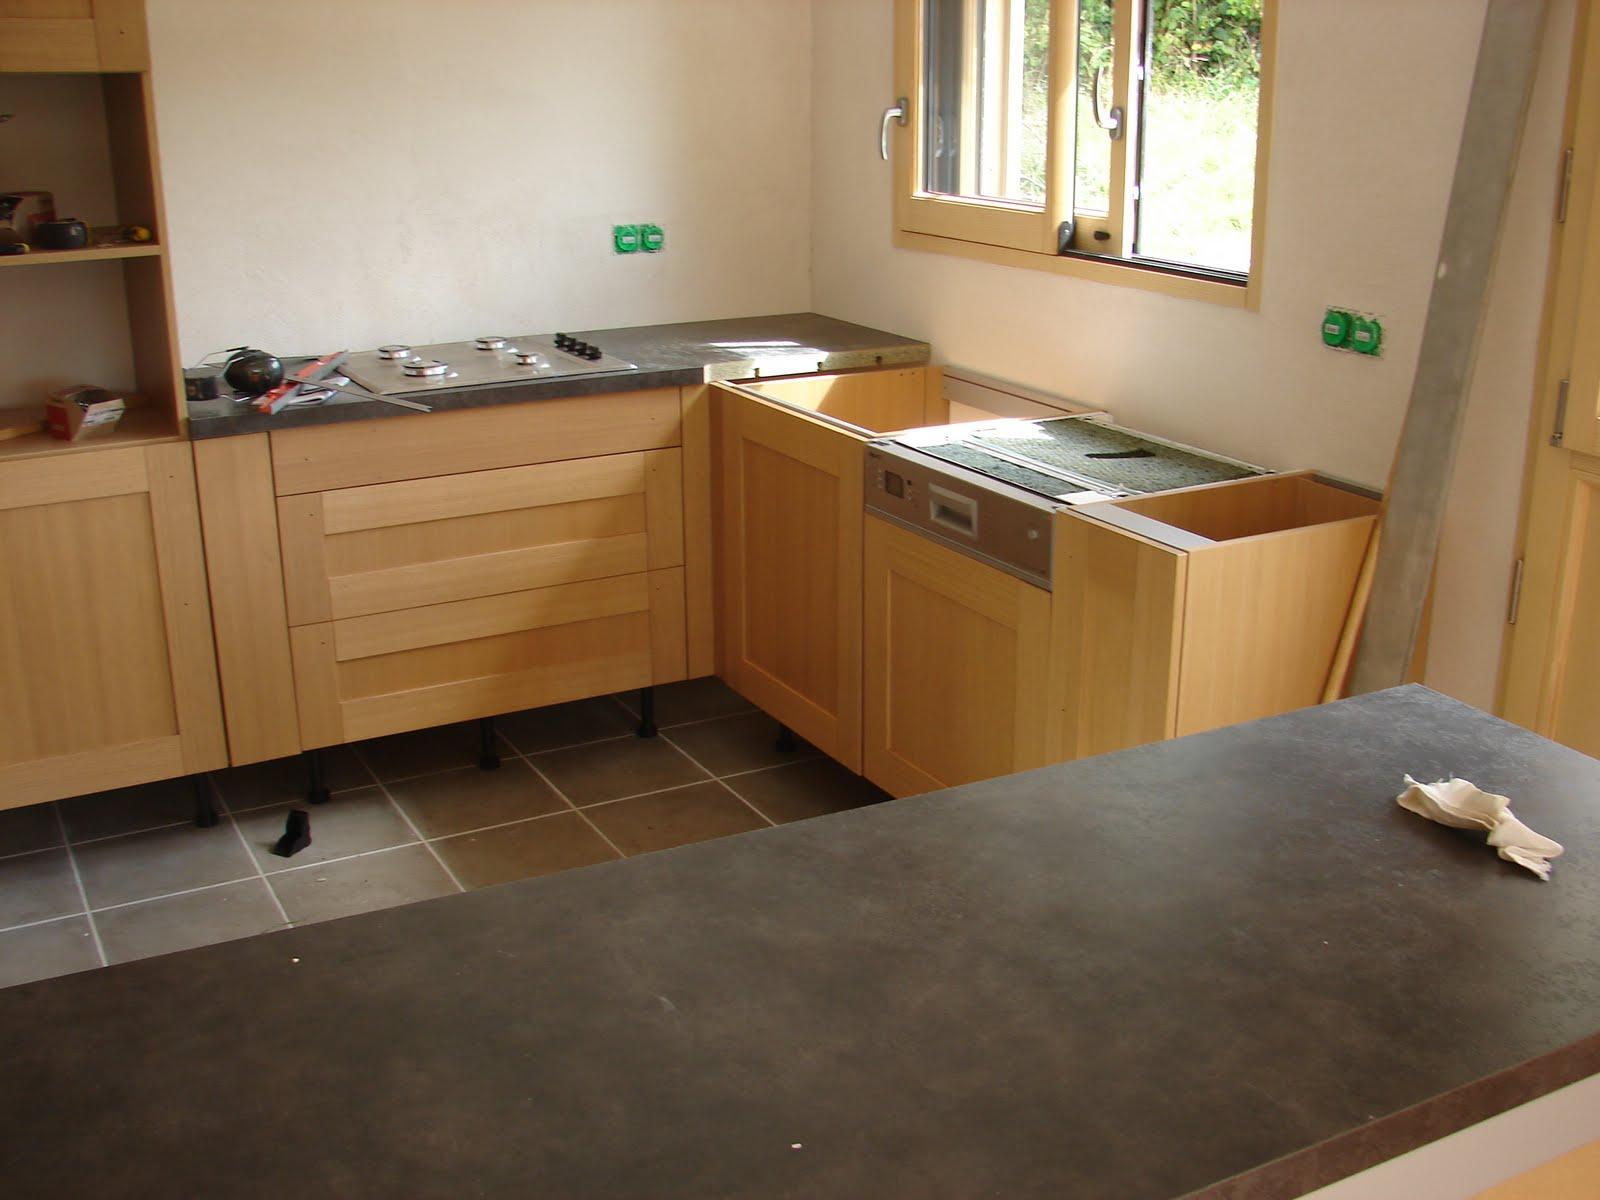 Avis sur cuisine socoo c ca du rseau socoouc millions uac for Assemblage meuble ikea